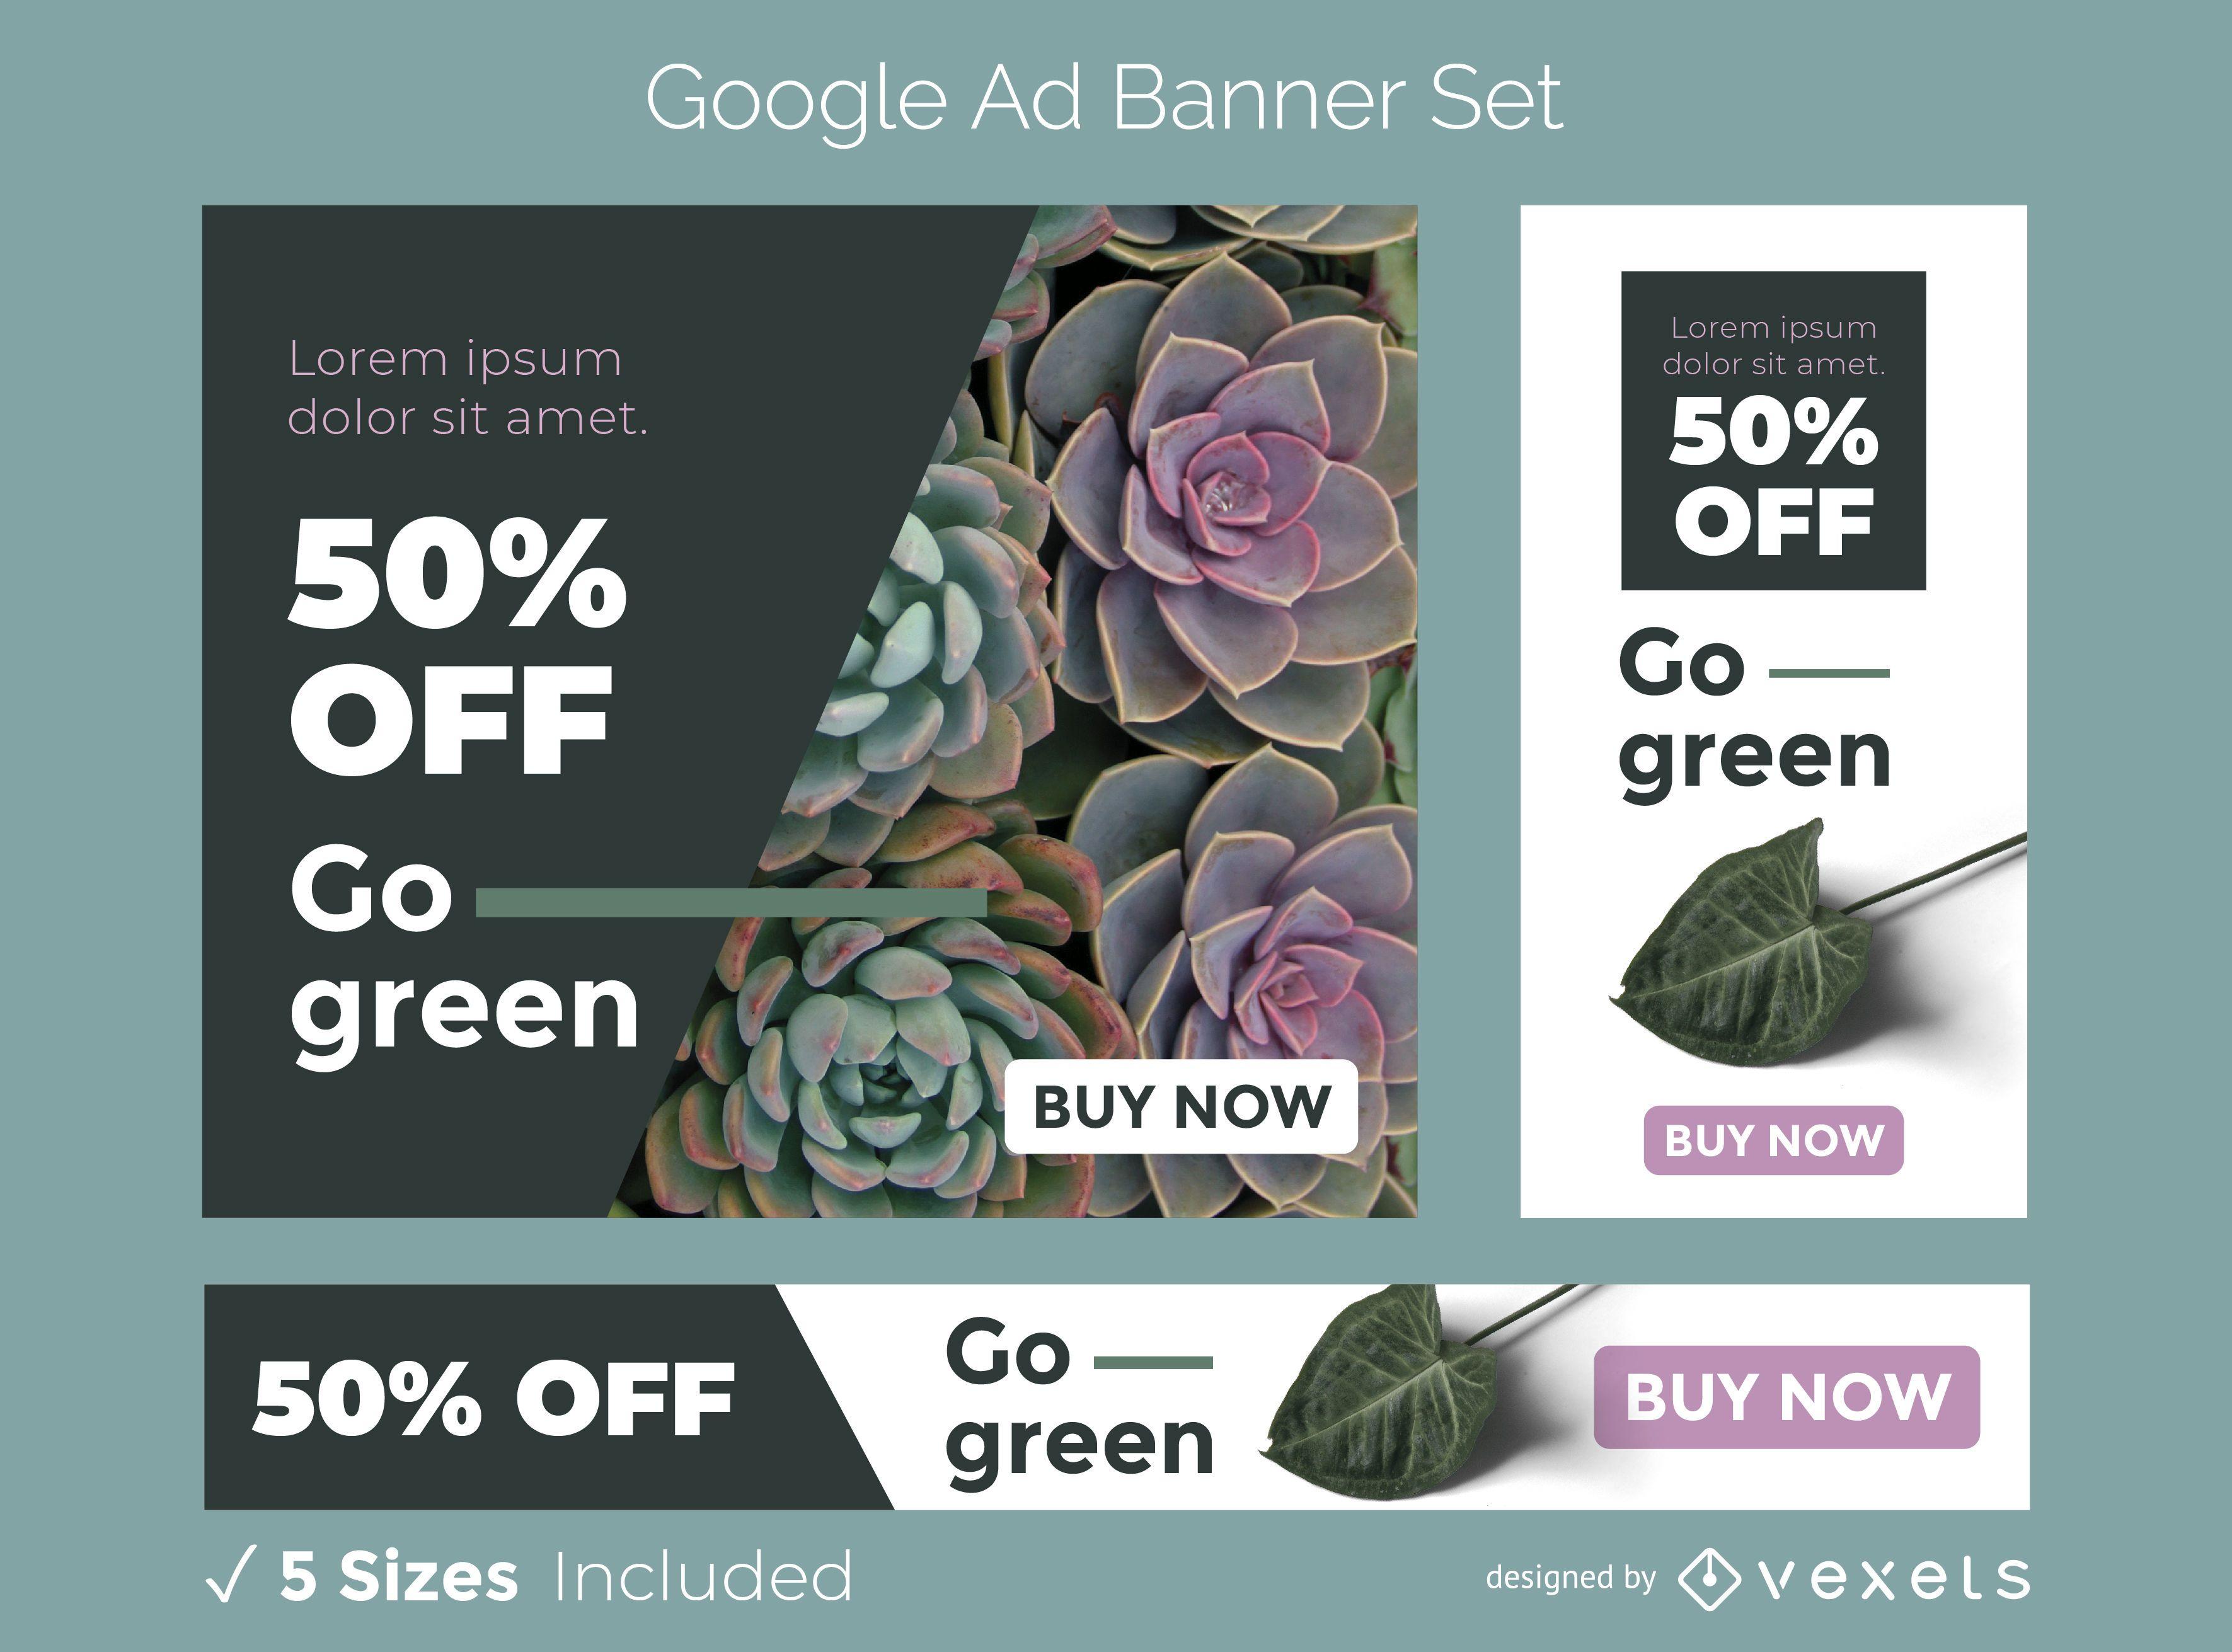 Go green ad banner set